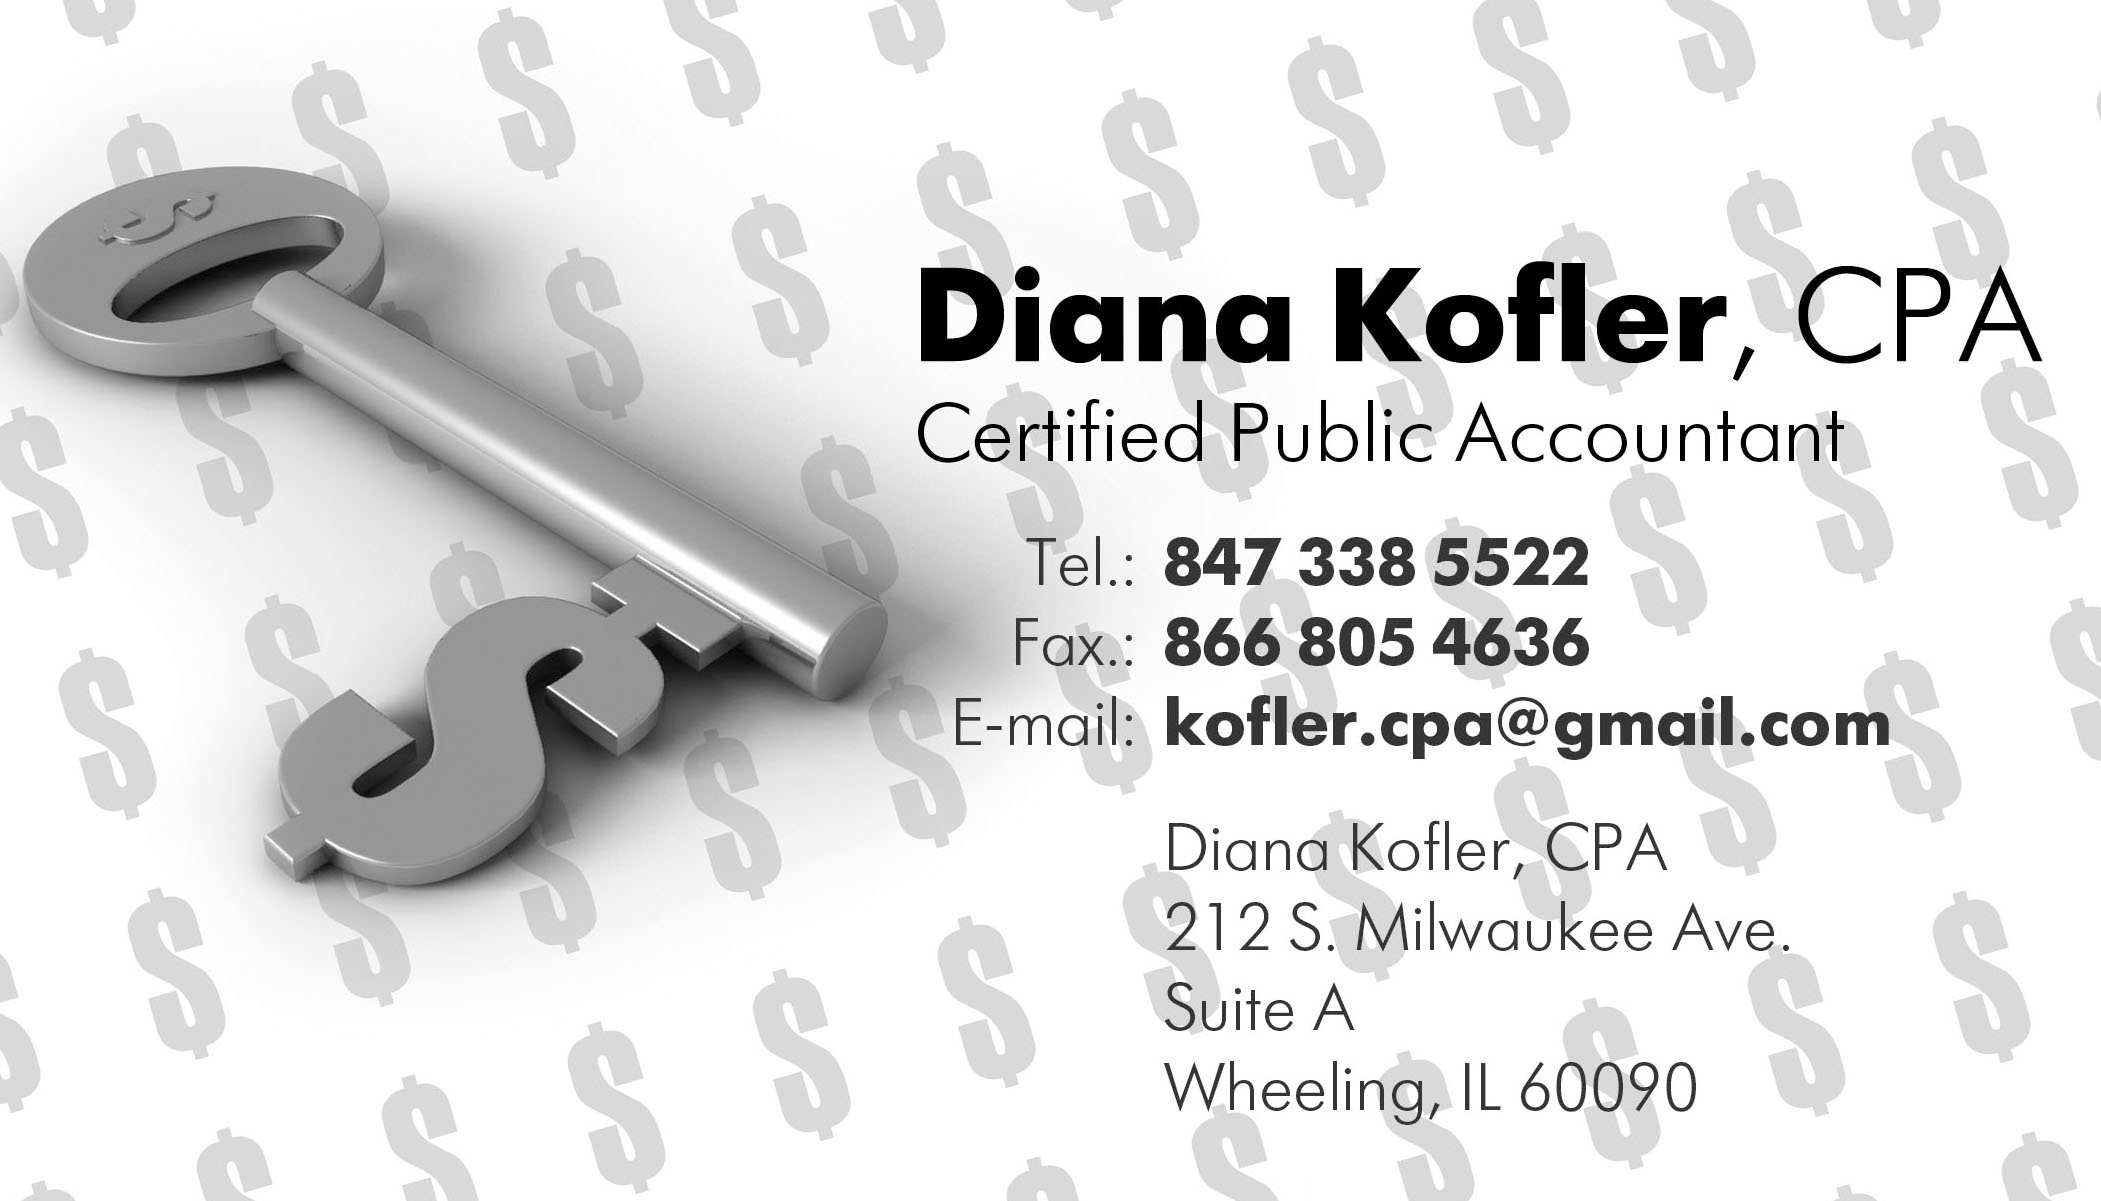 Diana Kofler, CPA Business Card Design |